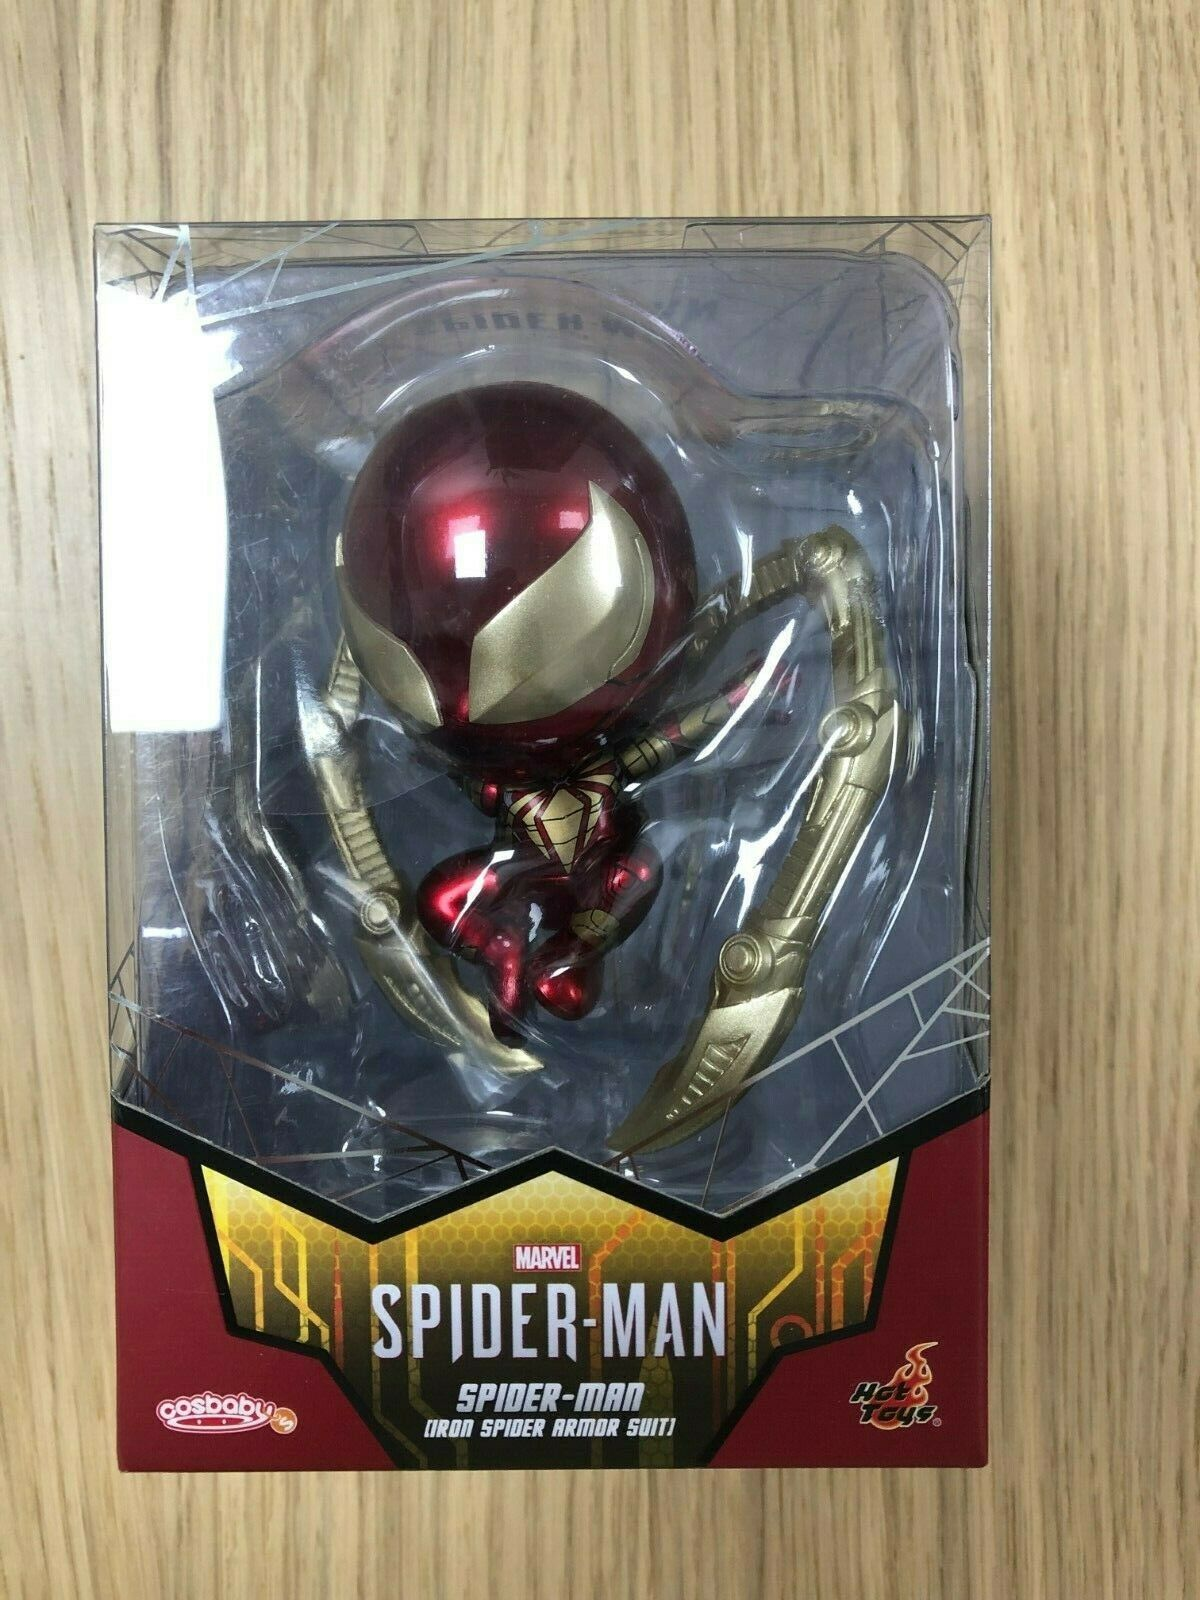 Caliente giocattoli Cosbambino COSB624 Marvel's Spider-uomo (Iron Spider Armor Suit Suit Suit Version) 67f177